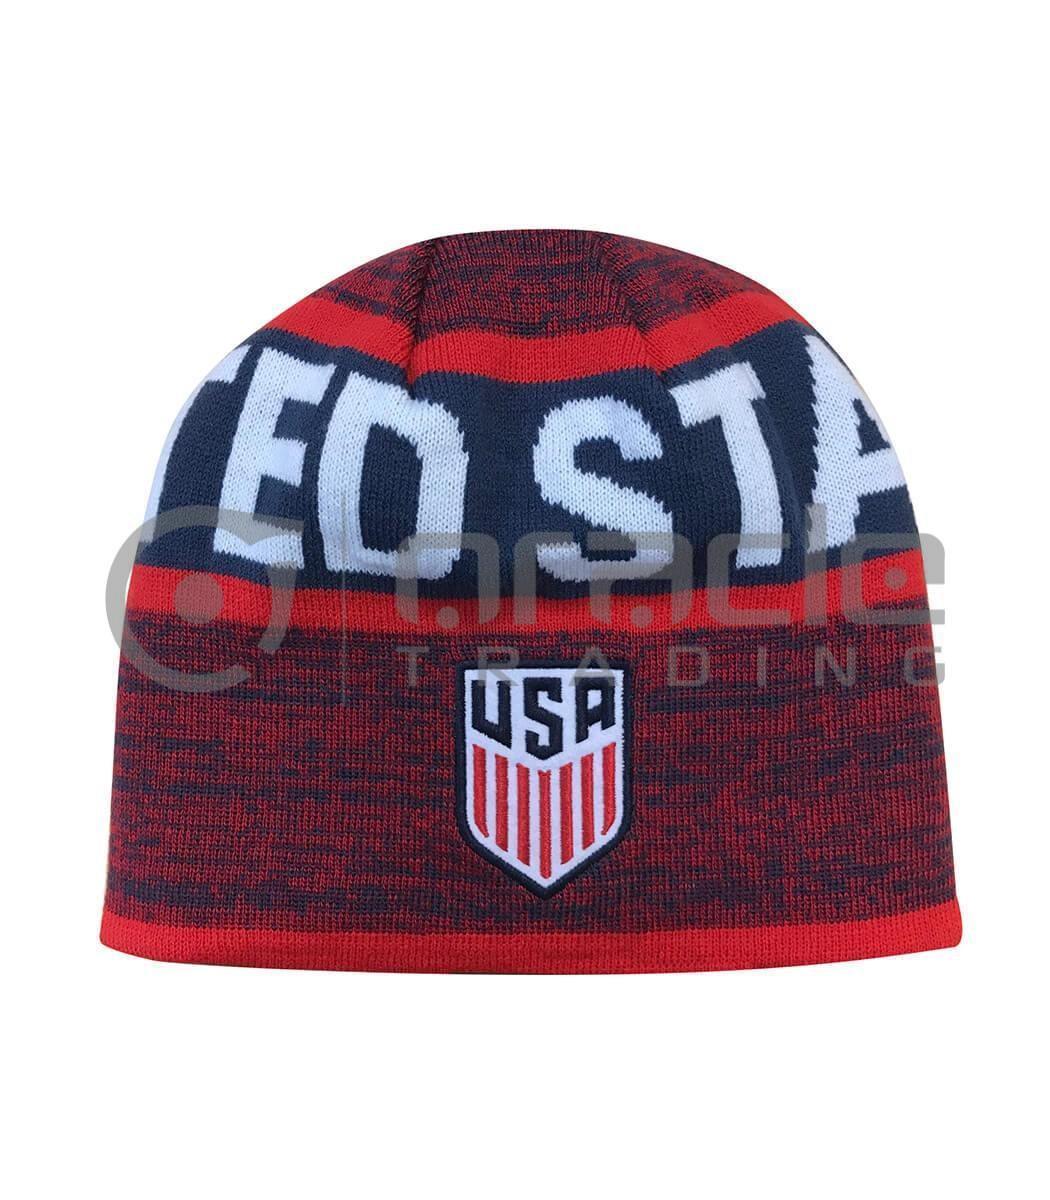 U.S. Soccer Beanie - Reversible